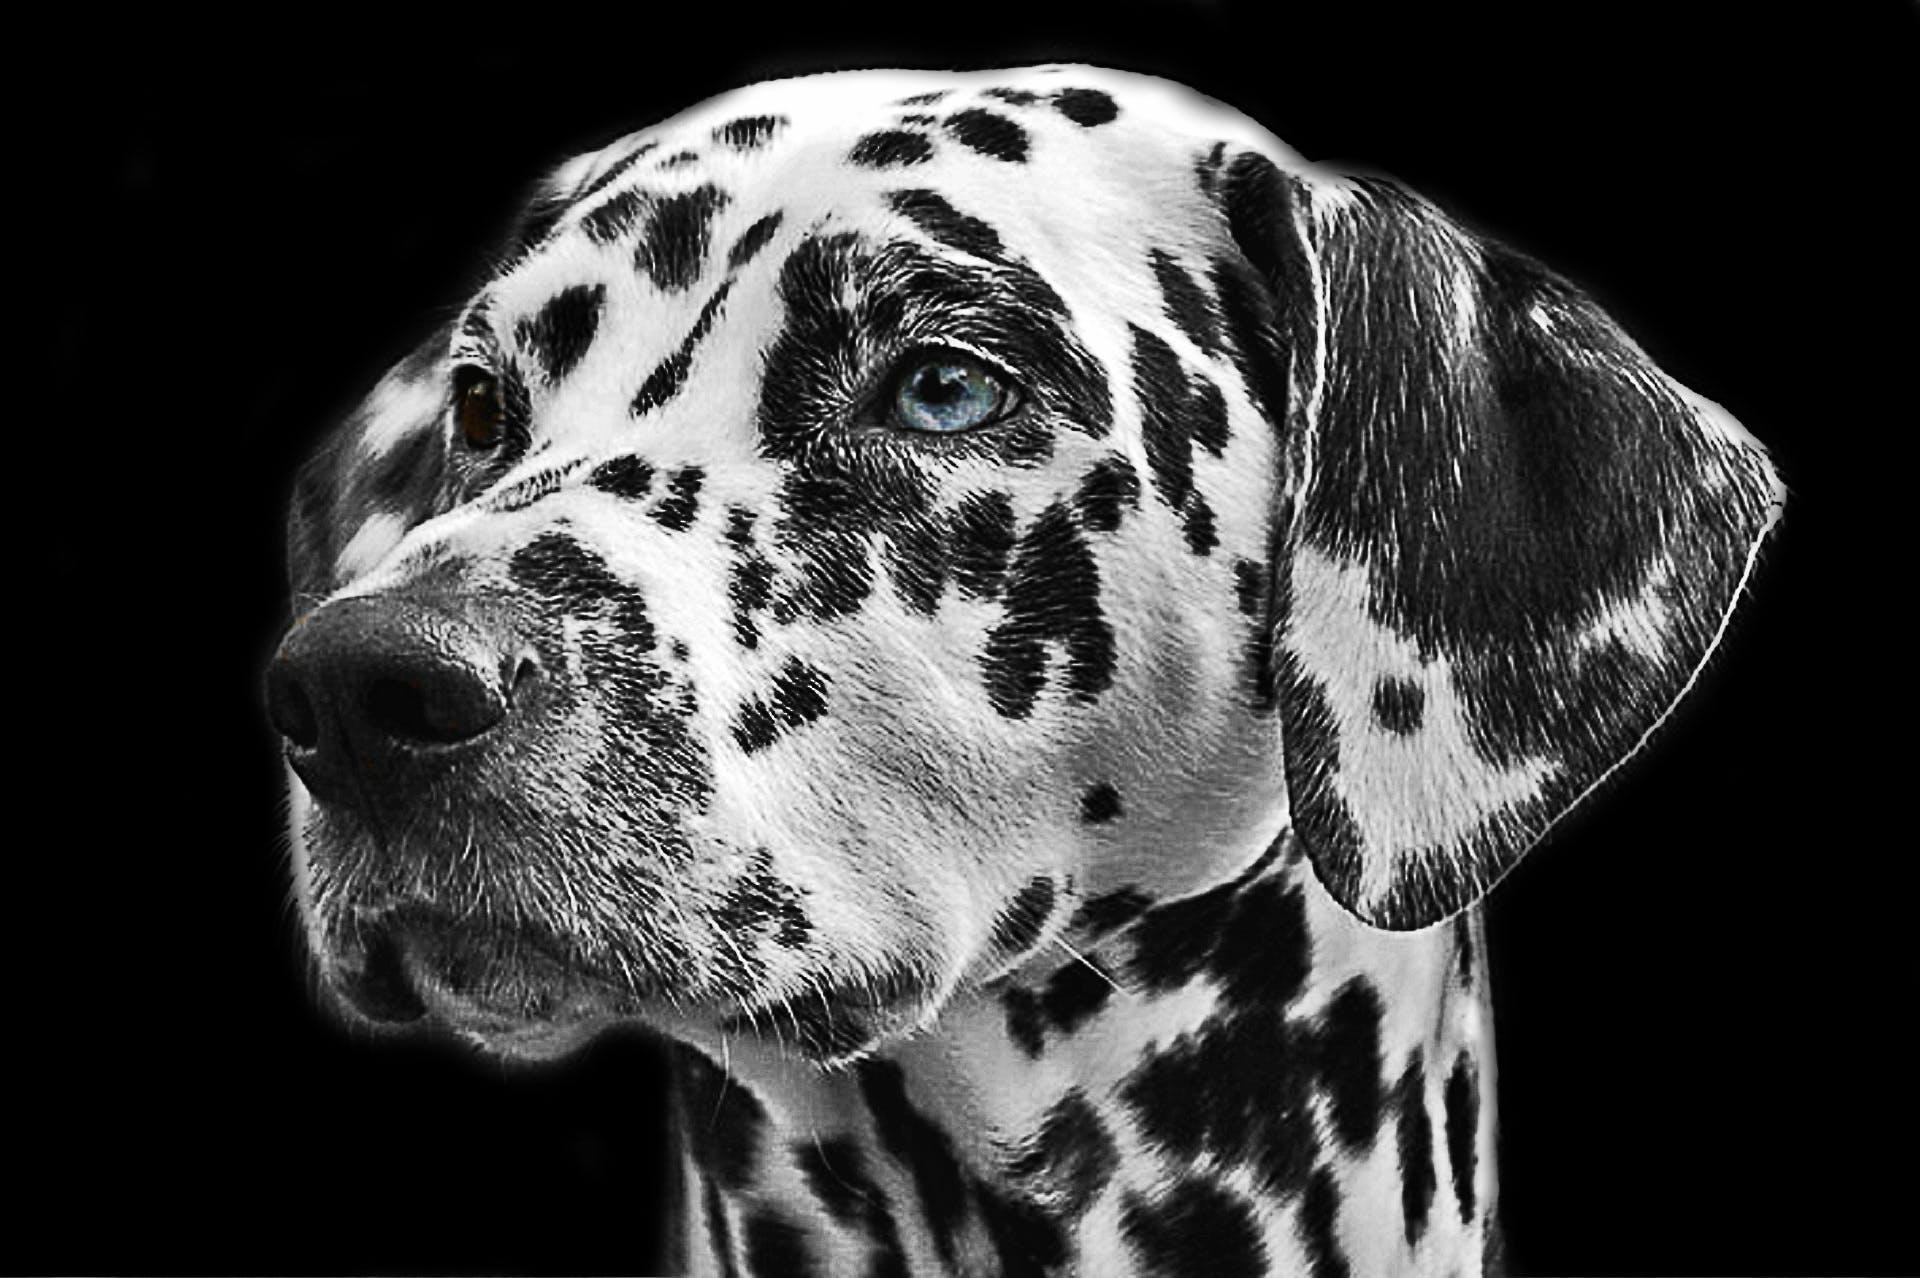 https://images.pexels.com/photos/36436/dalmatians-dog-animal-head.jpg?auto=compress&cs=tinysrgb&dpr=2&h=350